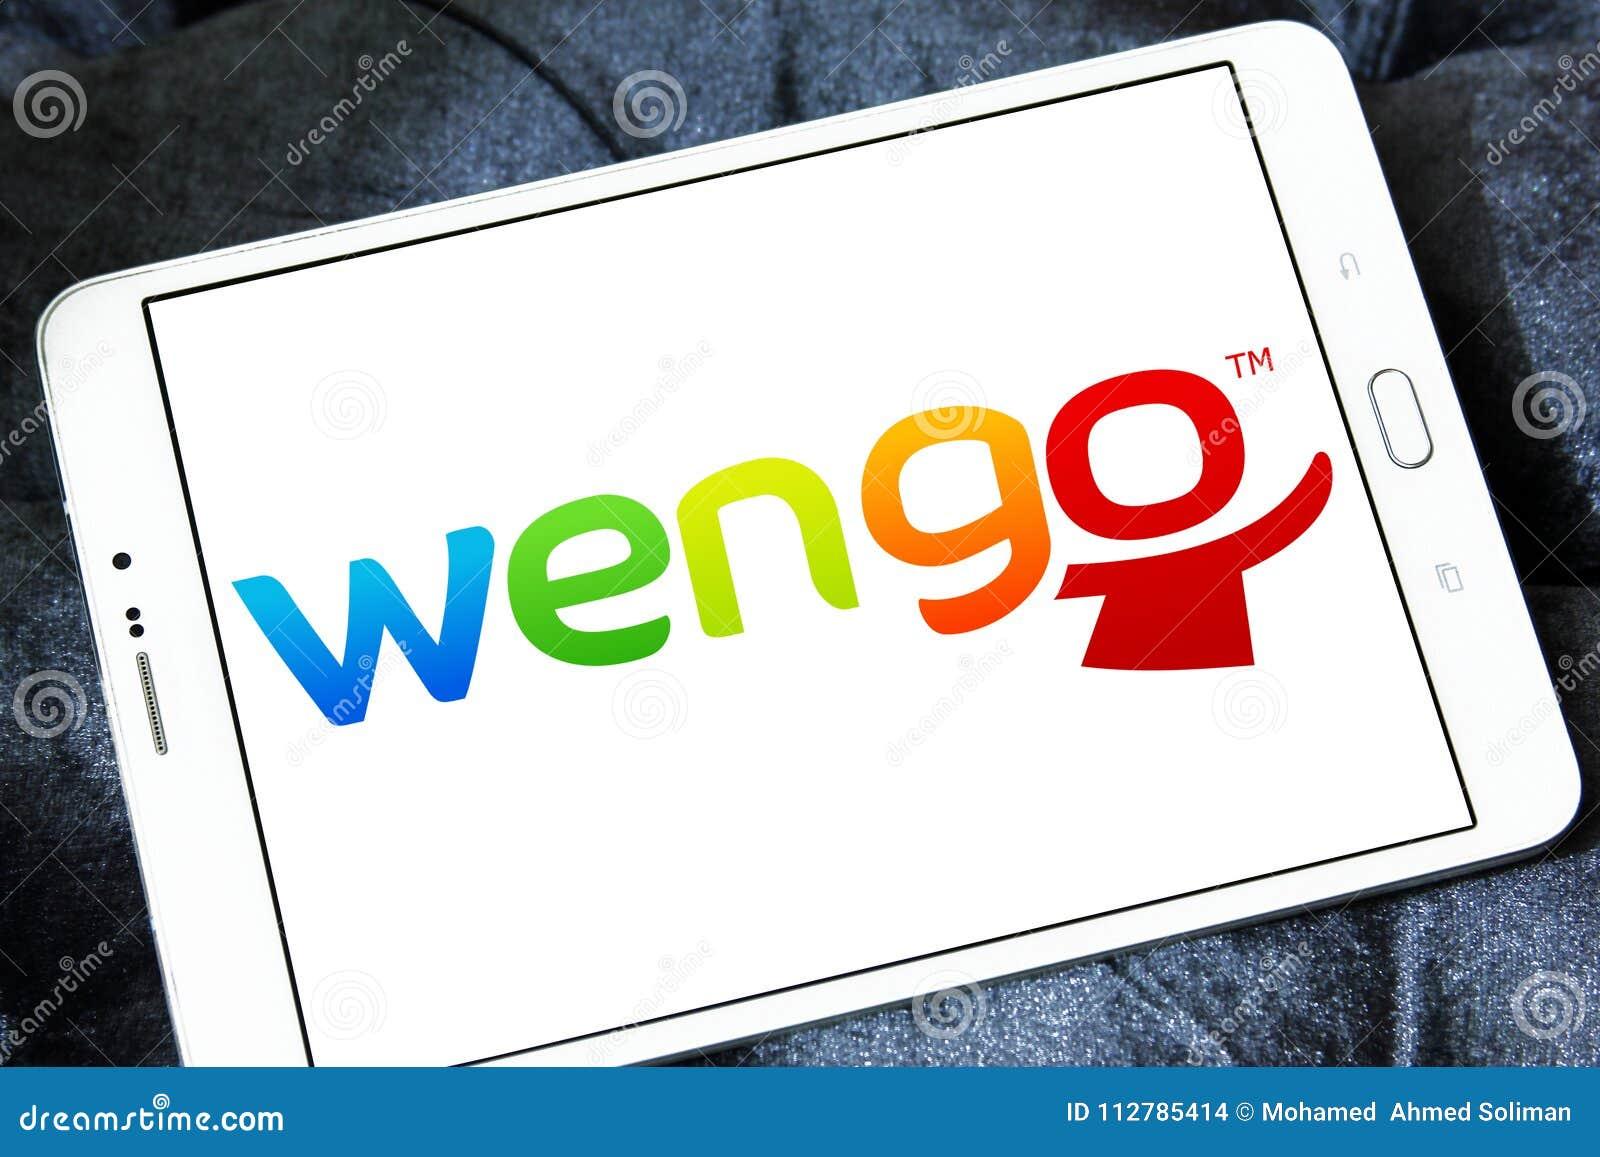 Wengo company logo editorial stock image  Image of motto